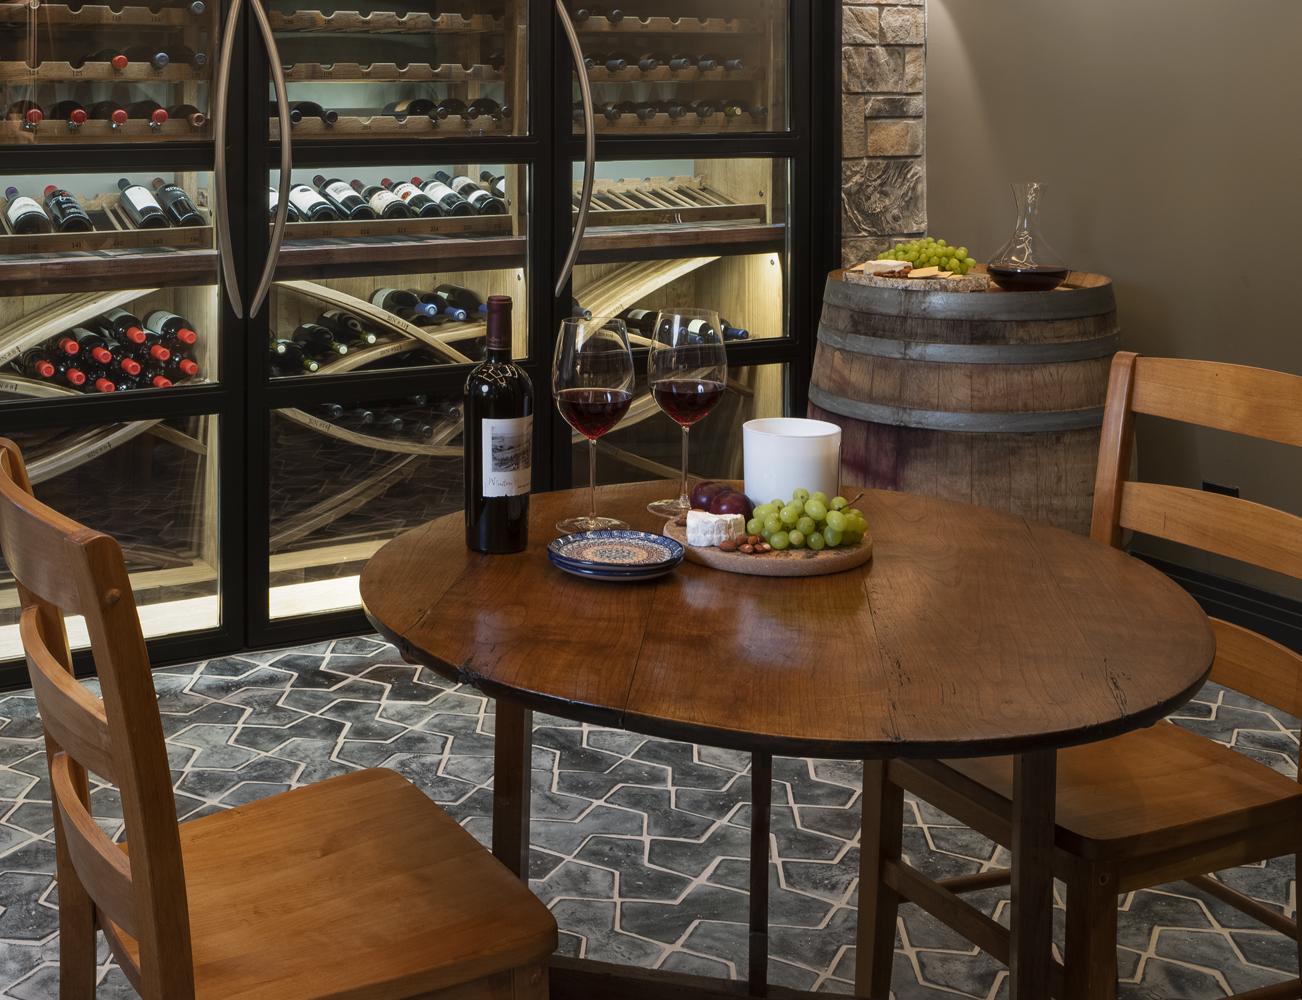 25-Wine Cellar7.jpg